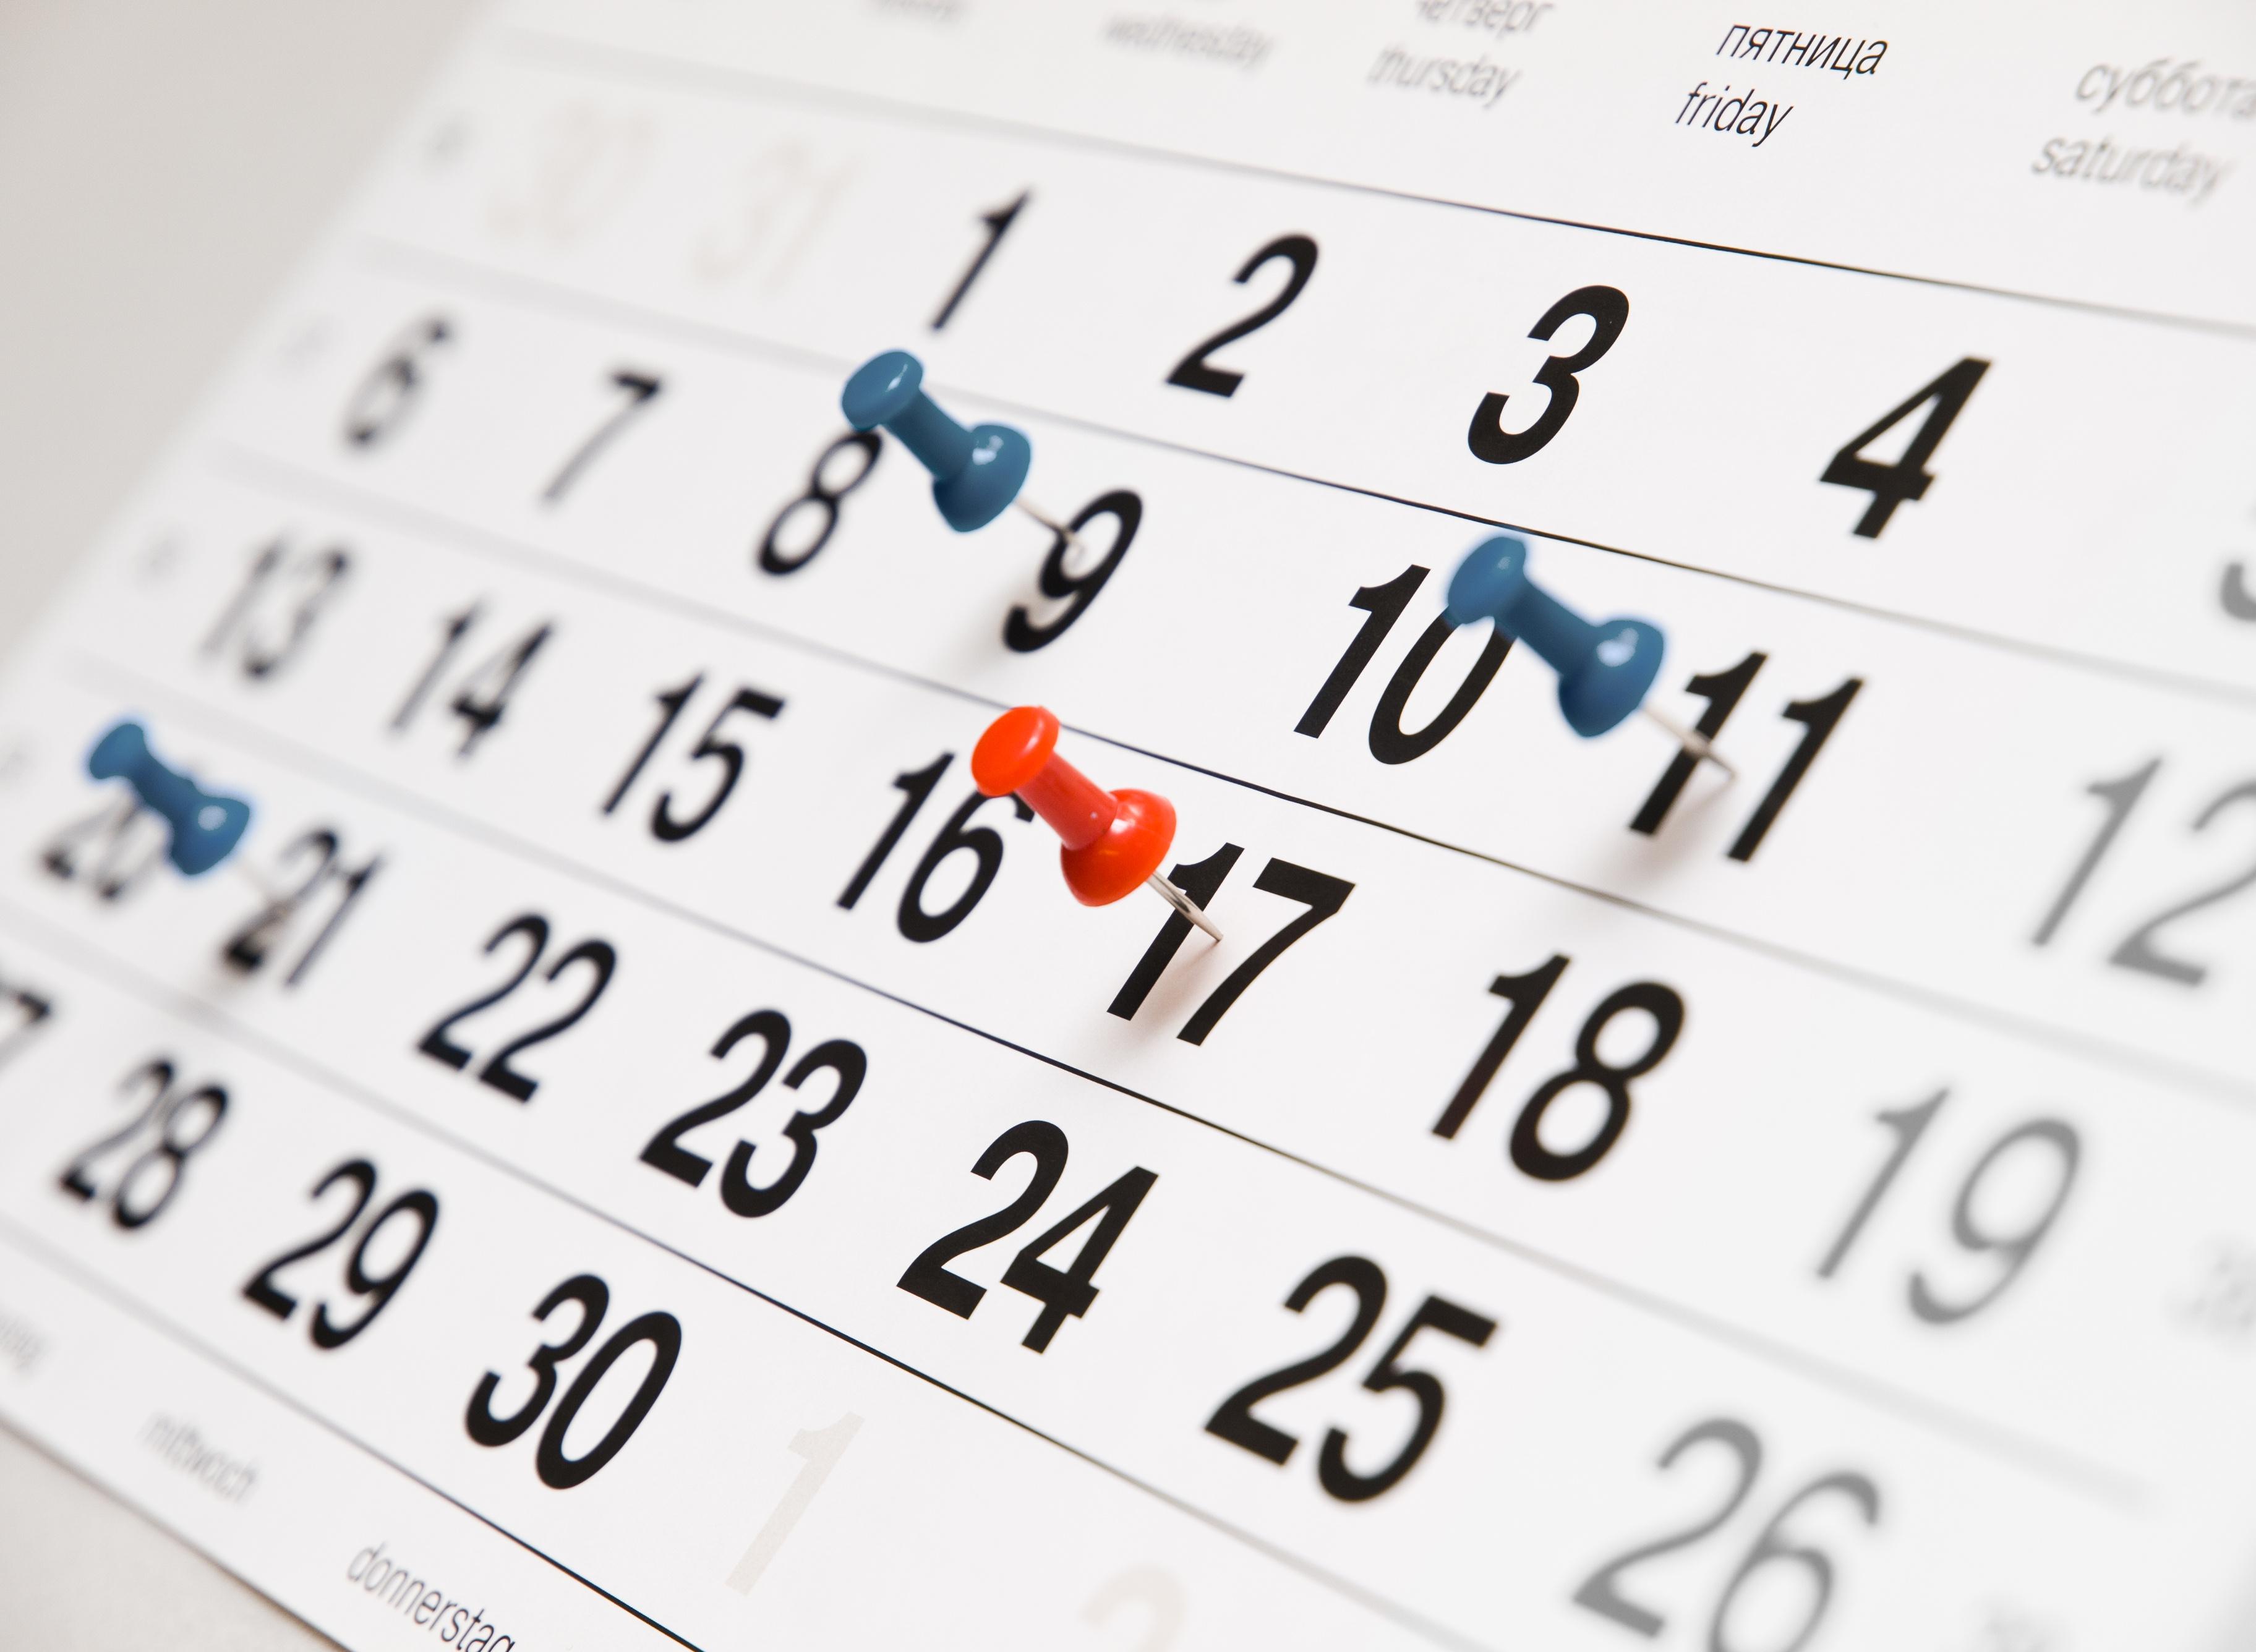 Due Date Calendar Clipart.